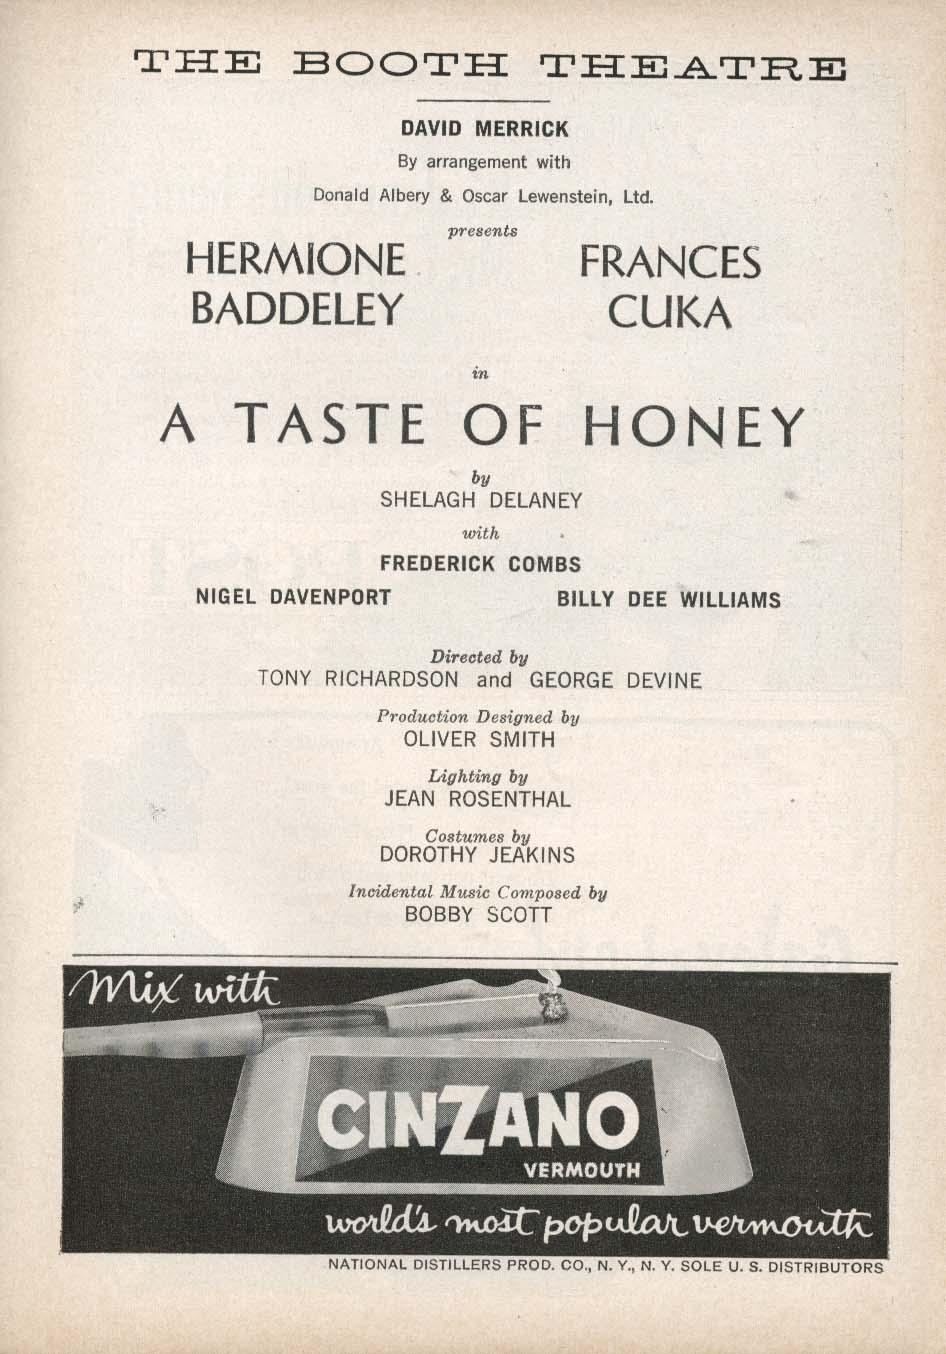 A Taste of Honey Playbill 5/22/61 Hermione Baddeley Frances Cuka Nigel Davenport